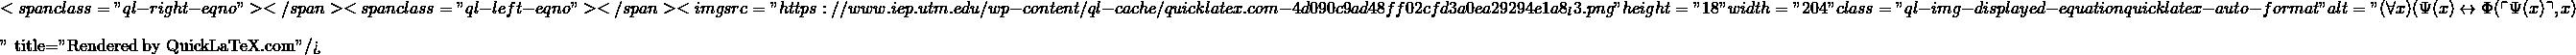 "\[<span class=""ql-right-eqno"">   </span><span class=""ql-left-eqno"">   </span><img src=""https://www.iep.utm.edu/wp-content/ql-cache/quicklatex.com-4d090c9ad48ff02cfd3a0ea29294e1a8_l3.png"" height=""18"" width=""204"" class=""ql-img-displayed-equation quicklatex-auto-format"" alt=""\begin{equation*} (\forall x)(\Psi(x) \leftrightarrow \Phi(\ulcorner \Psi(x) \urcorner, x) \end{equation*}"" title=""Rendered by QuickLaTeX.com""/>\]"